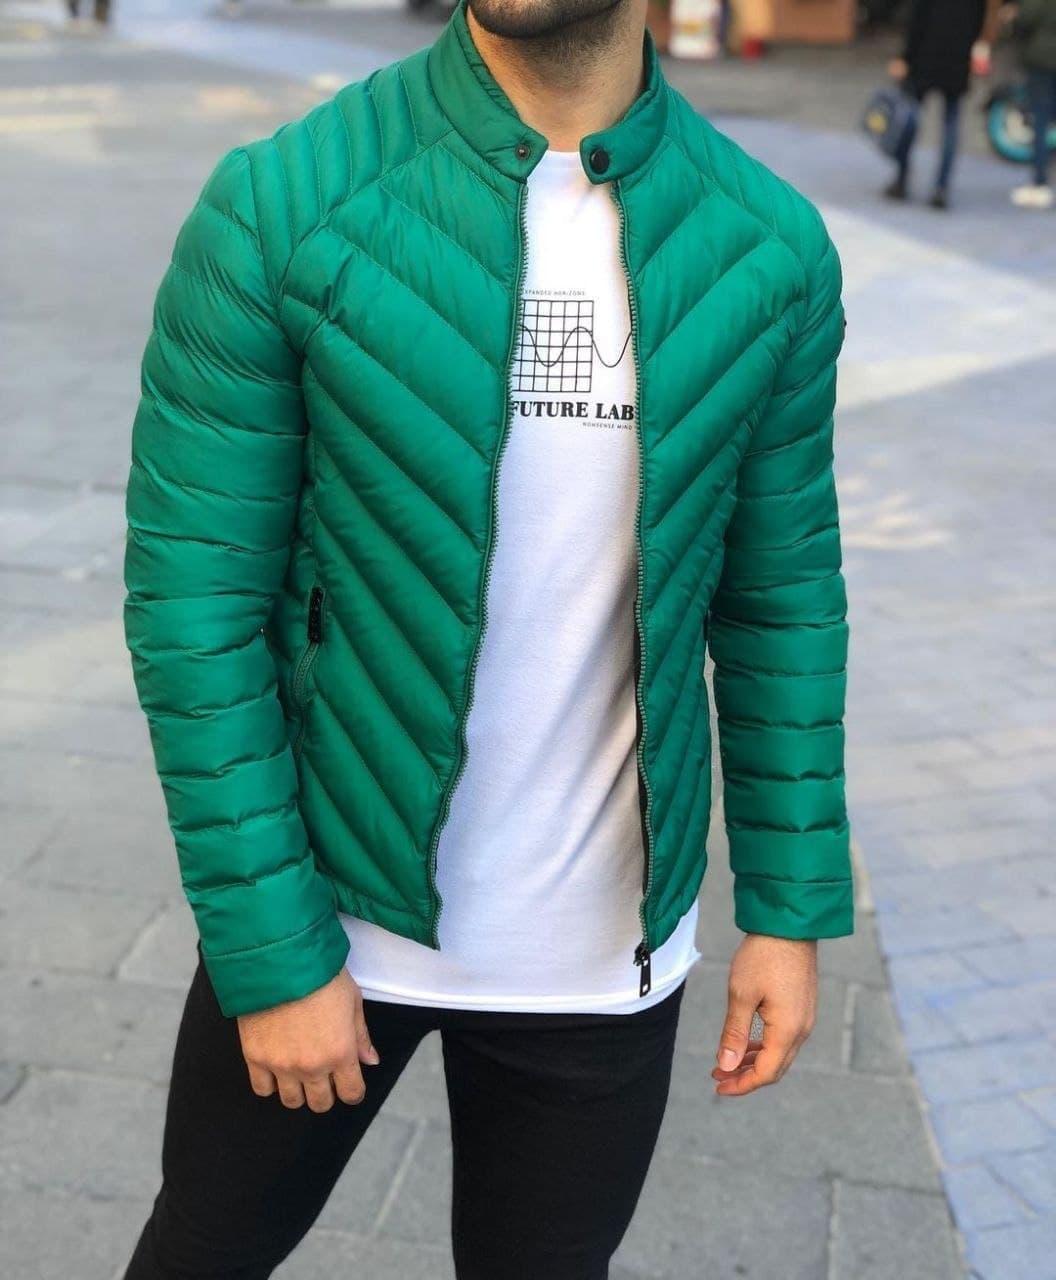 Куртка мужская весна-осень демисезонная без капюшона зеленая Турция. Живое фото. Чоловіча куртка осінь-весна